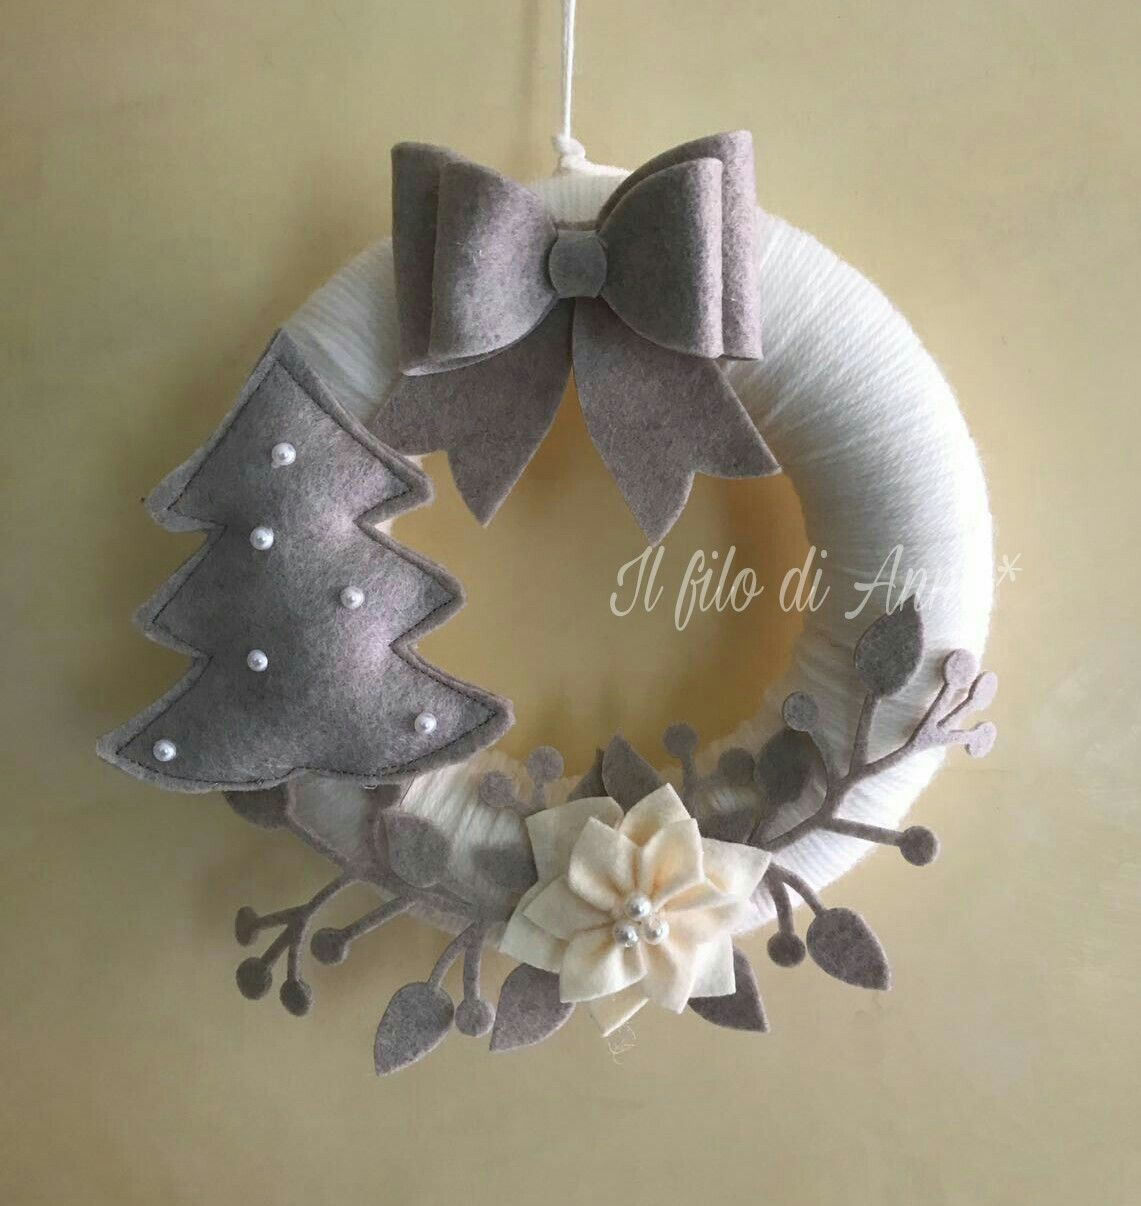 Ghirlanda feltro lana fiocco alberello stella natale rami wreath advent pinterest natale - Pinterest natale ...